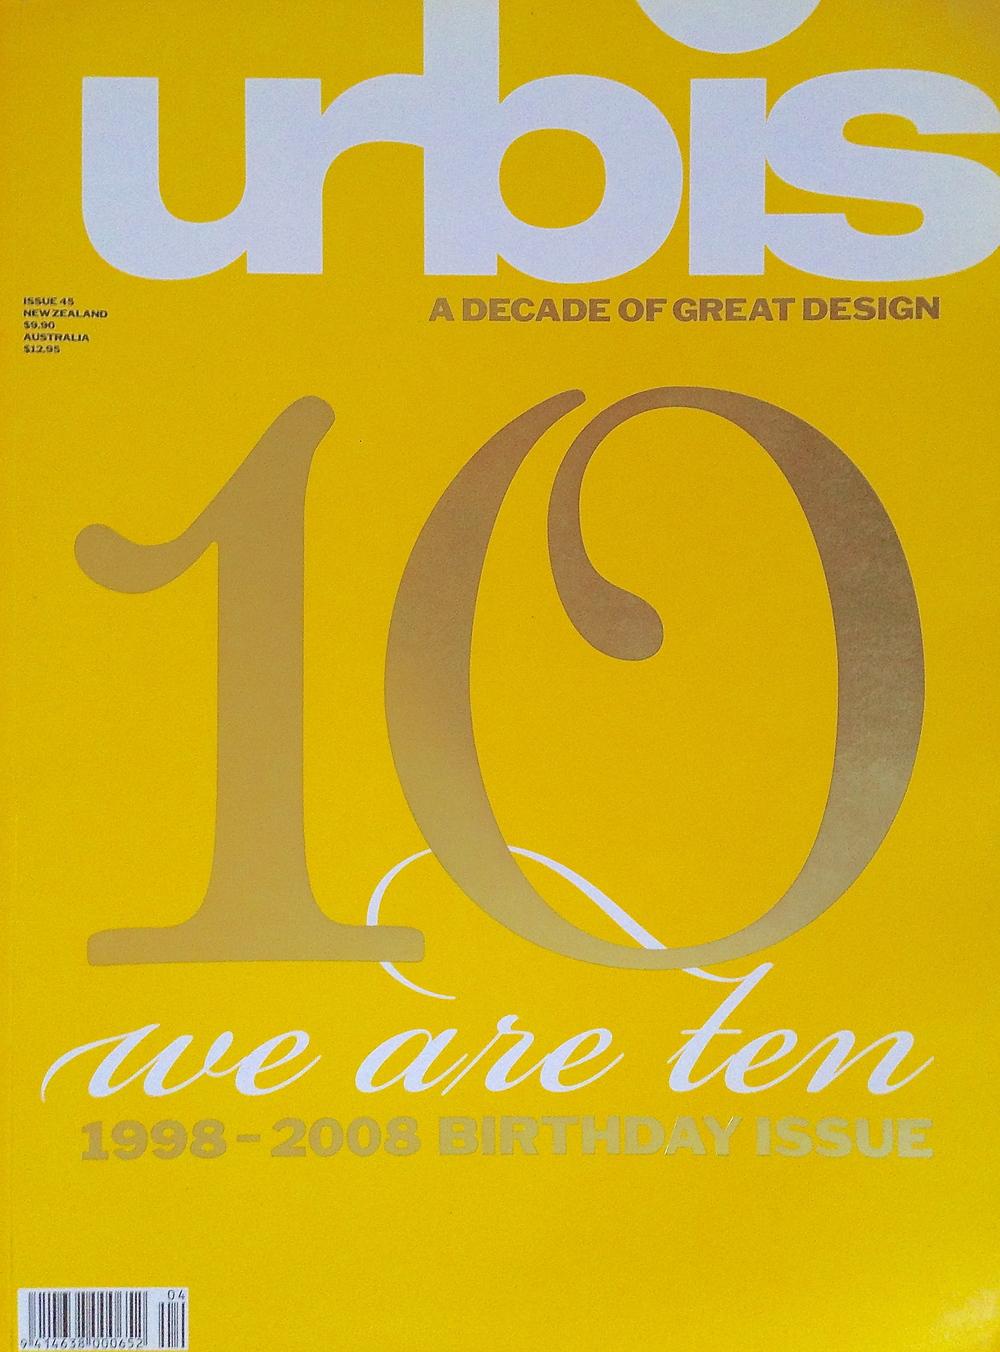 Urbis 2008-09_cover.jpg